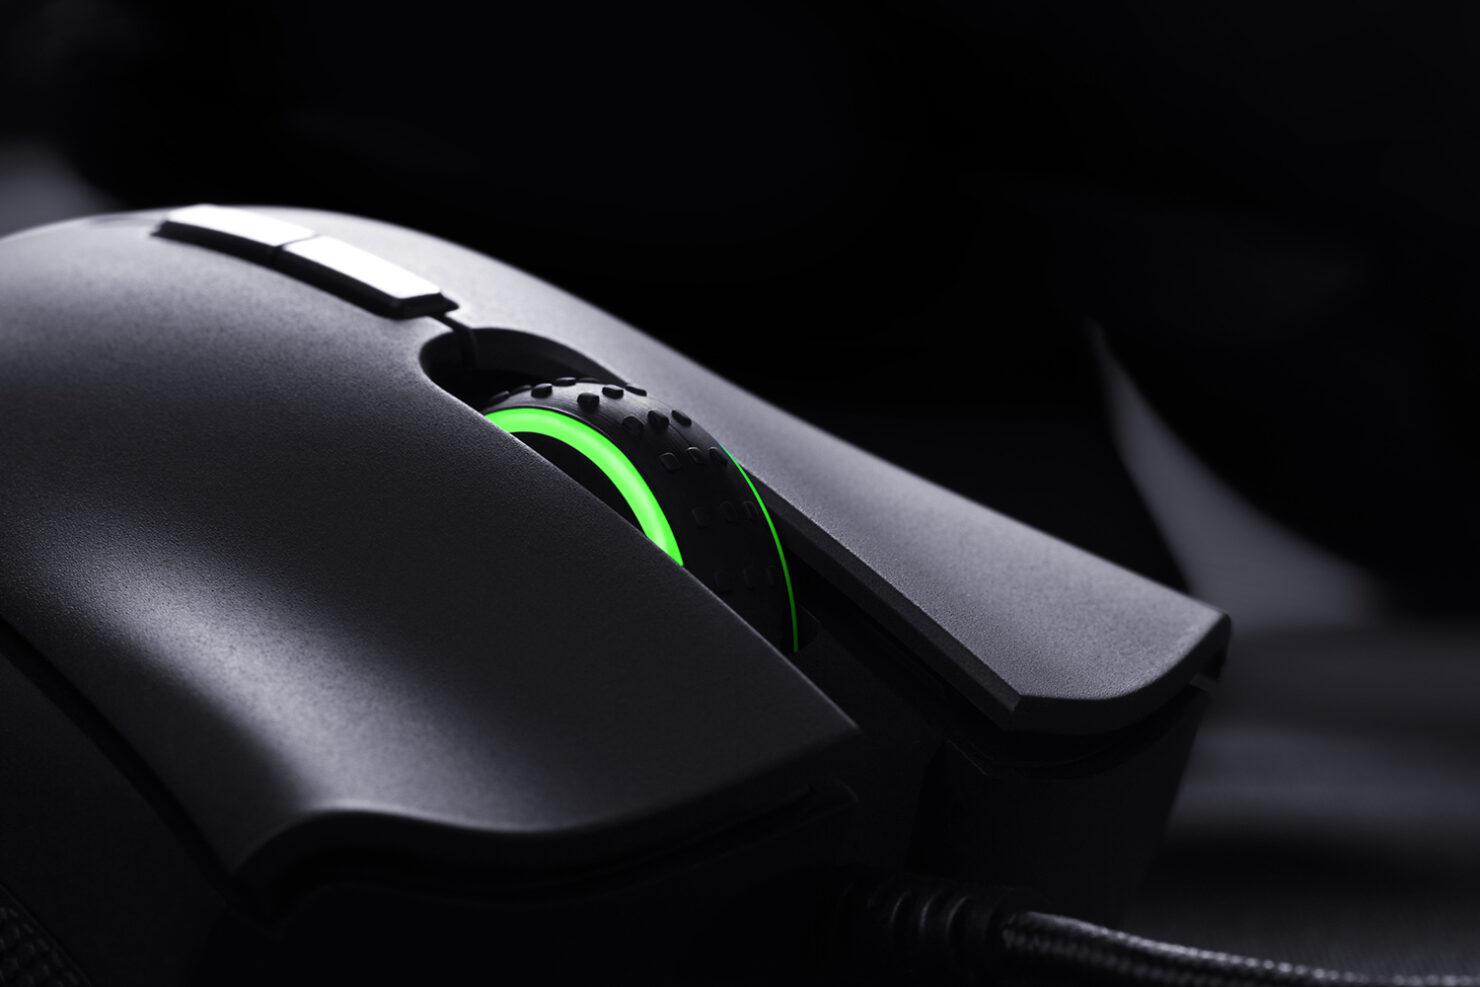 Razer Releases Its Deathadder Elite – New Optical Sensor Combined With a Huge DPI Rating